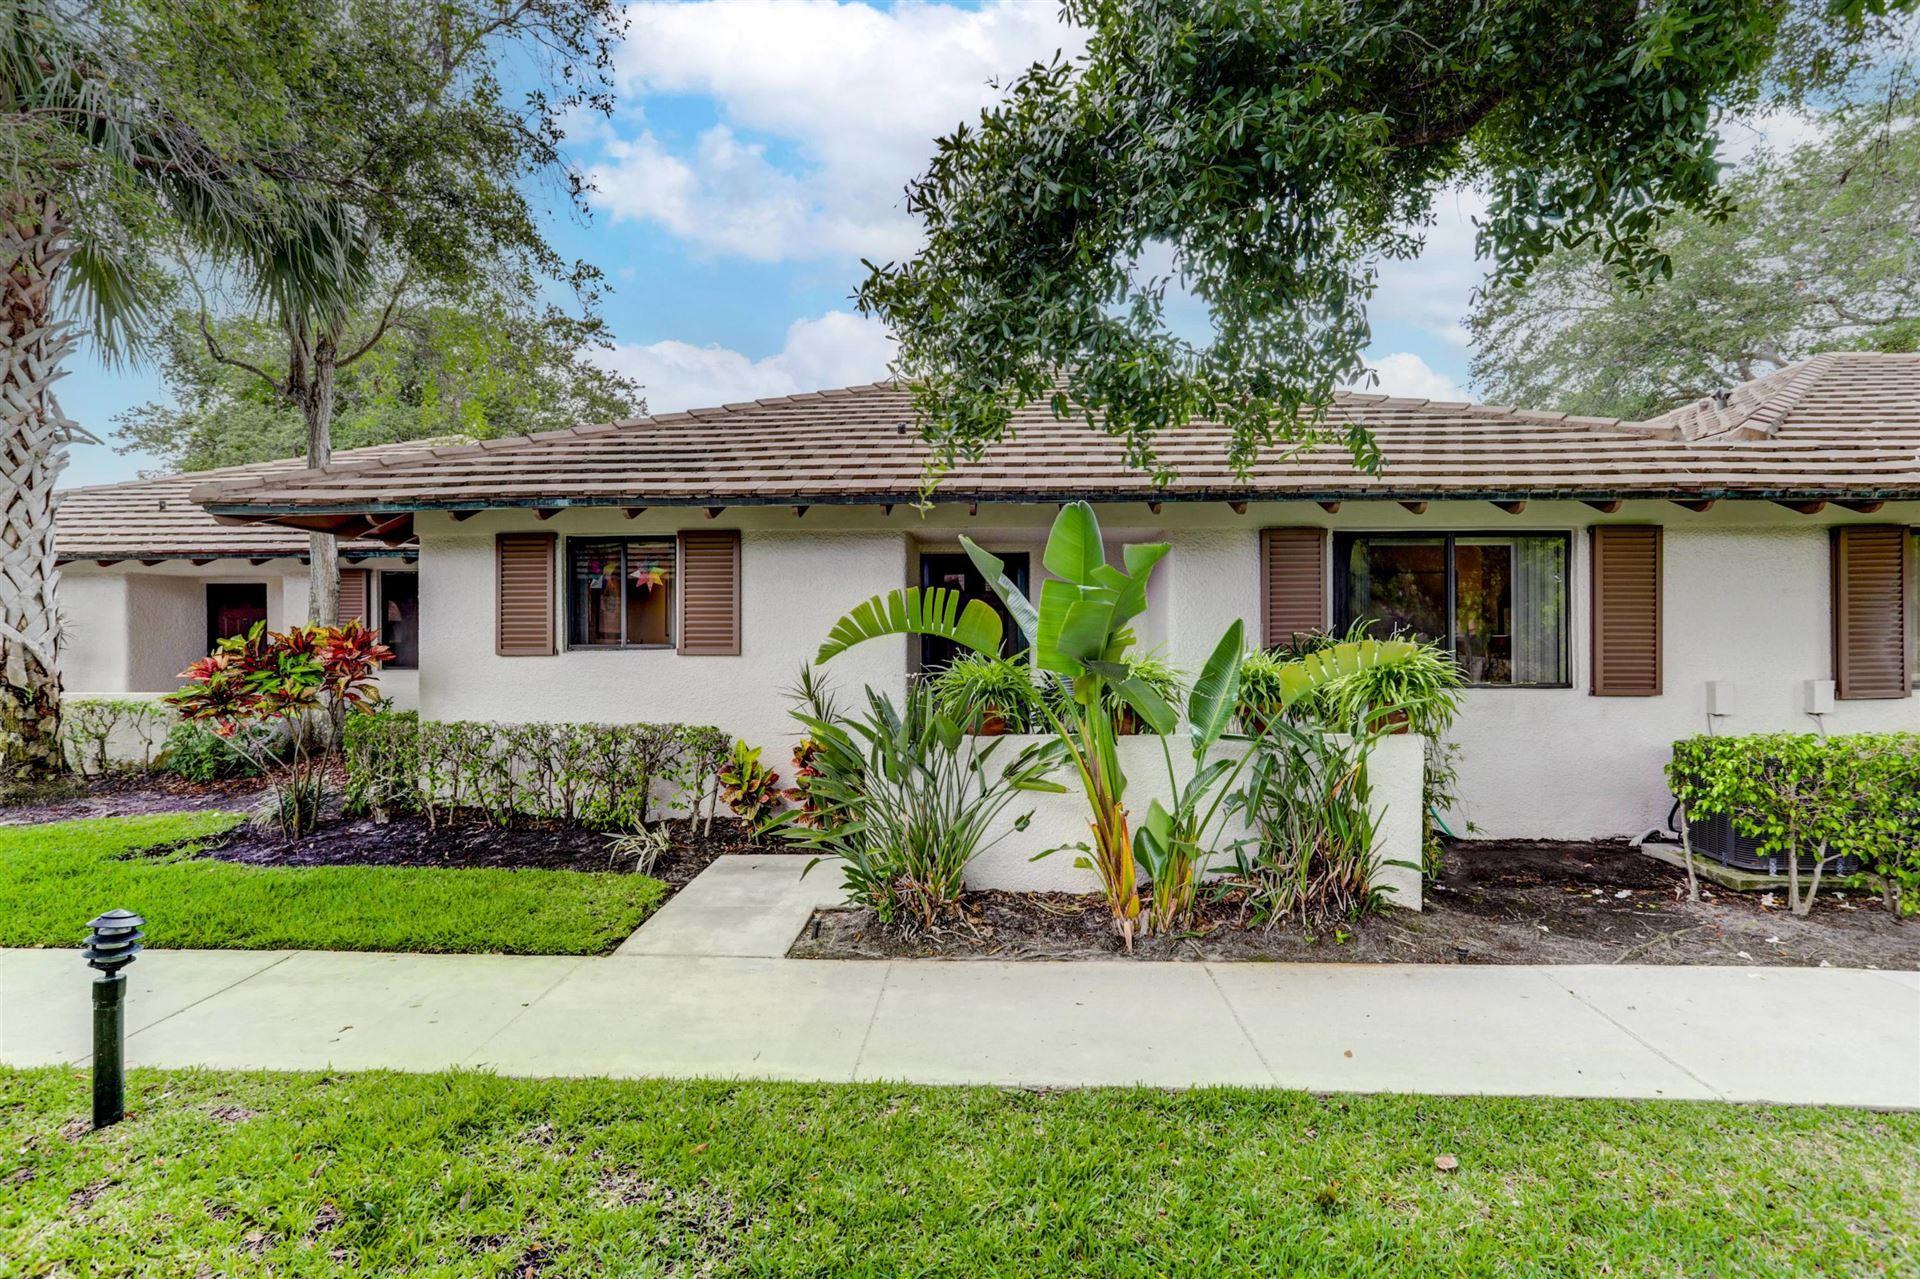 Photo of 214 Club Drive, Palm Beach Gardens, FL 33418 (MLS # RX-10716225)